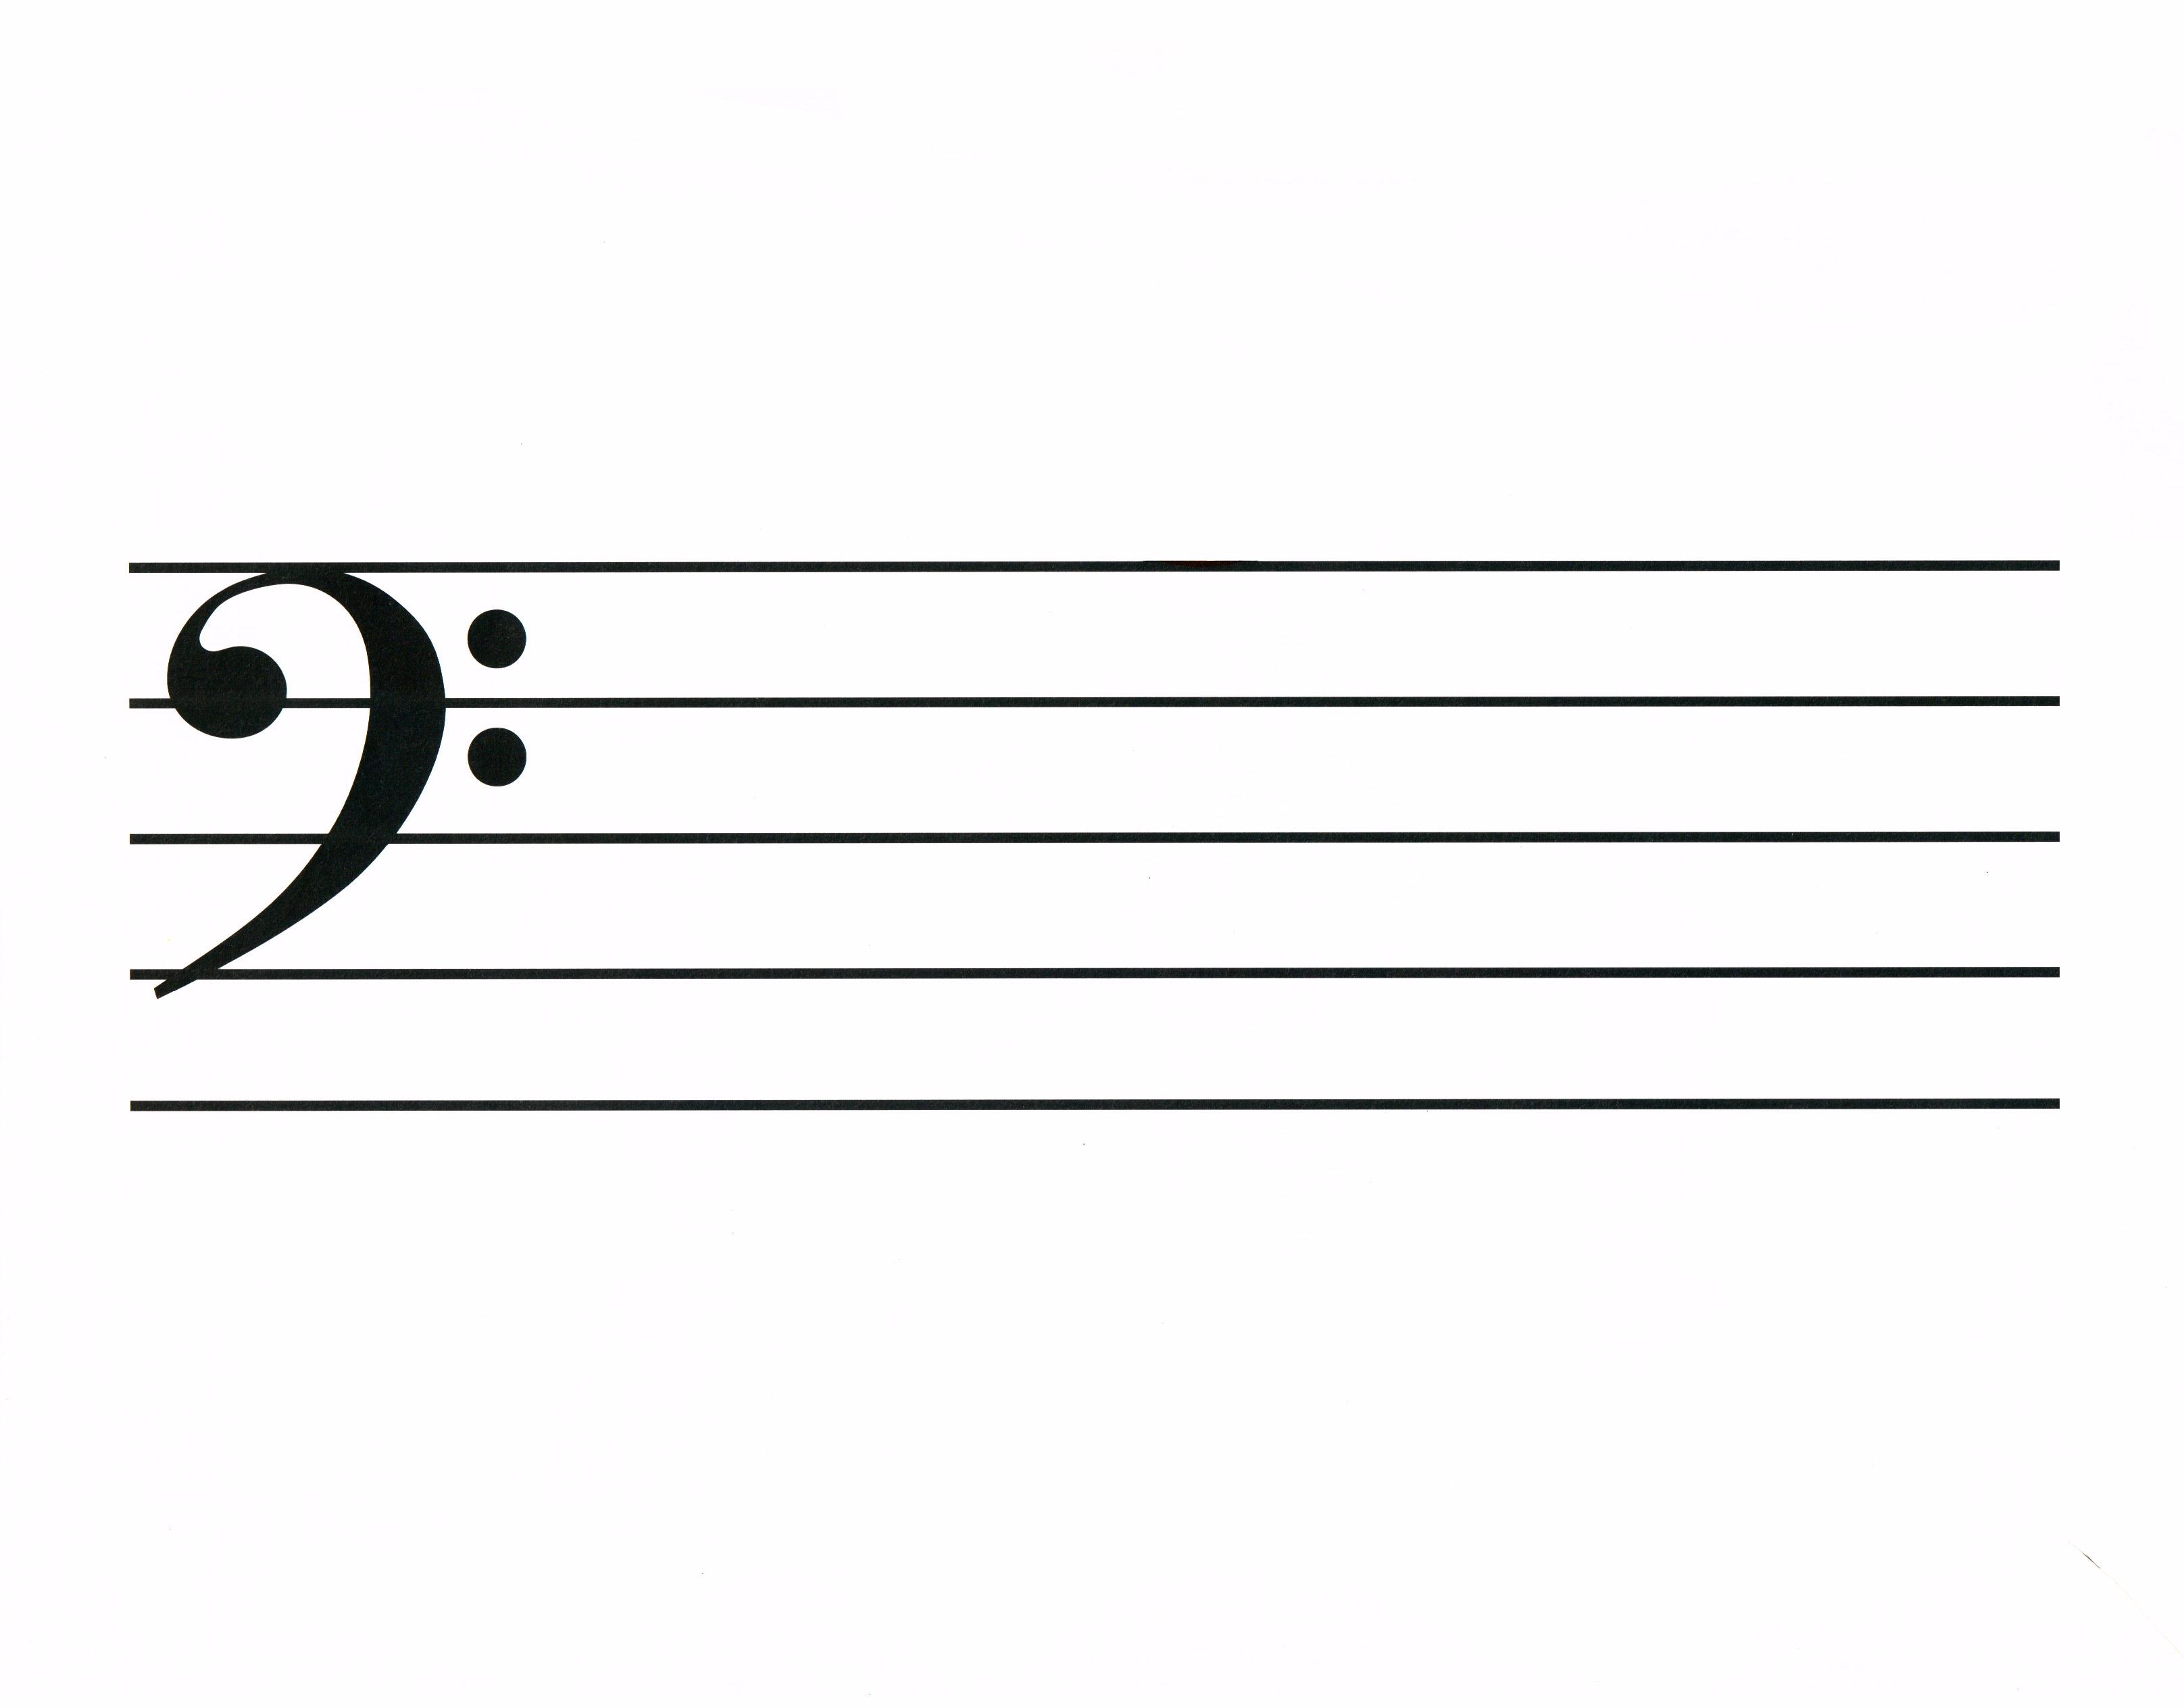 blank bass clef staff - photo #1